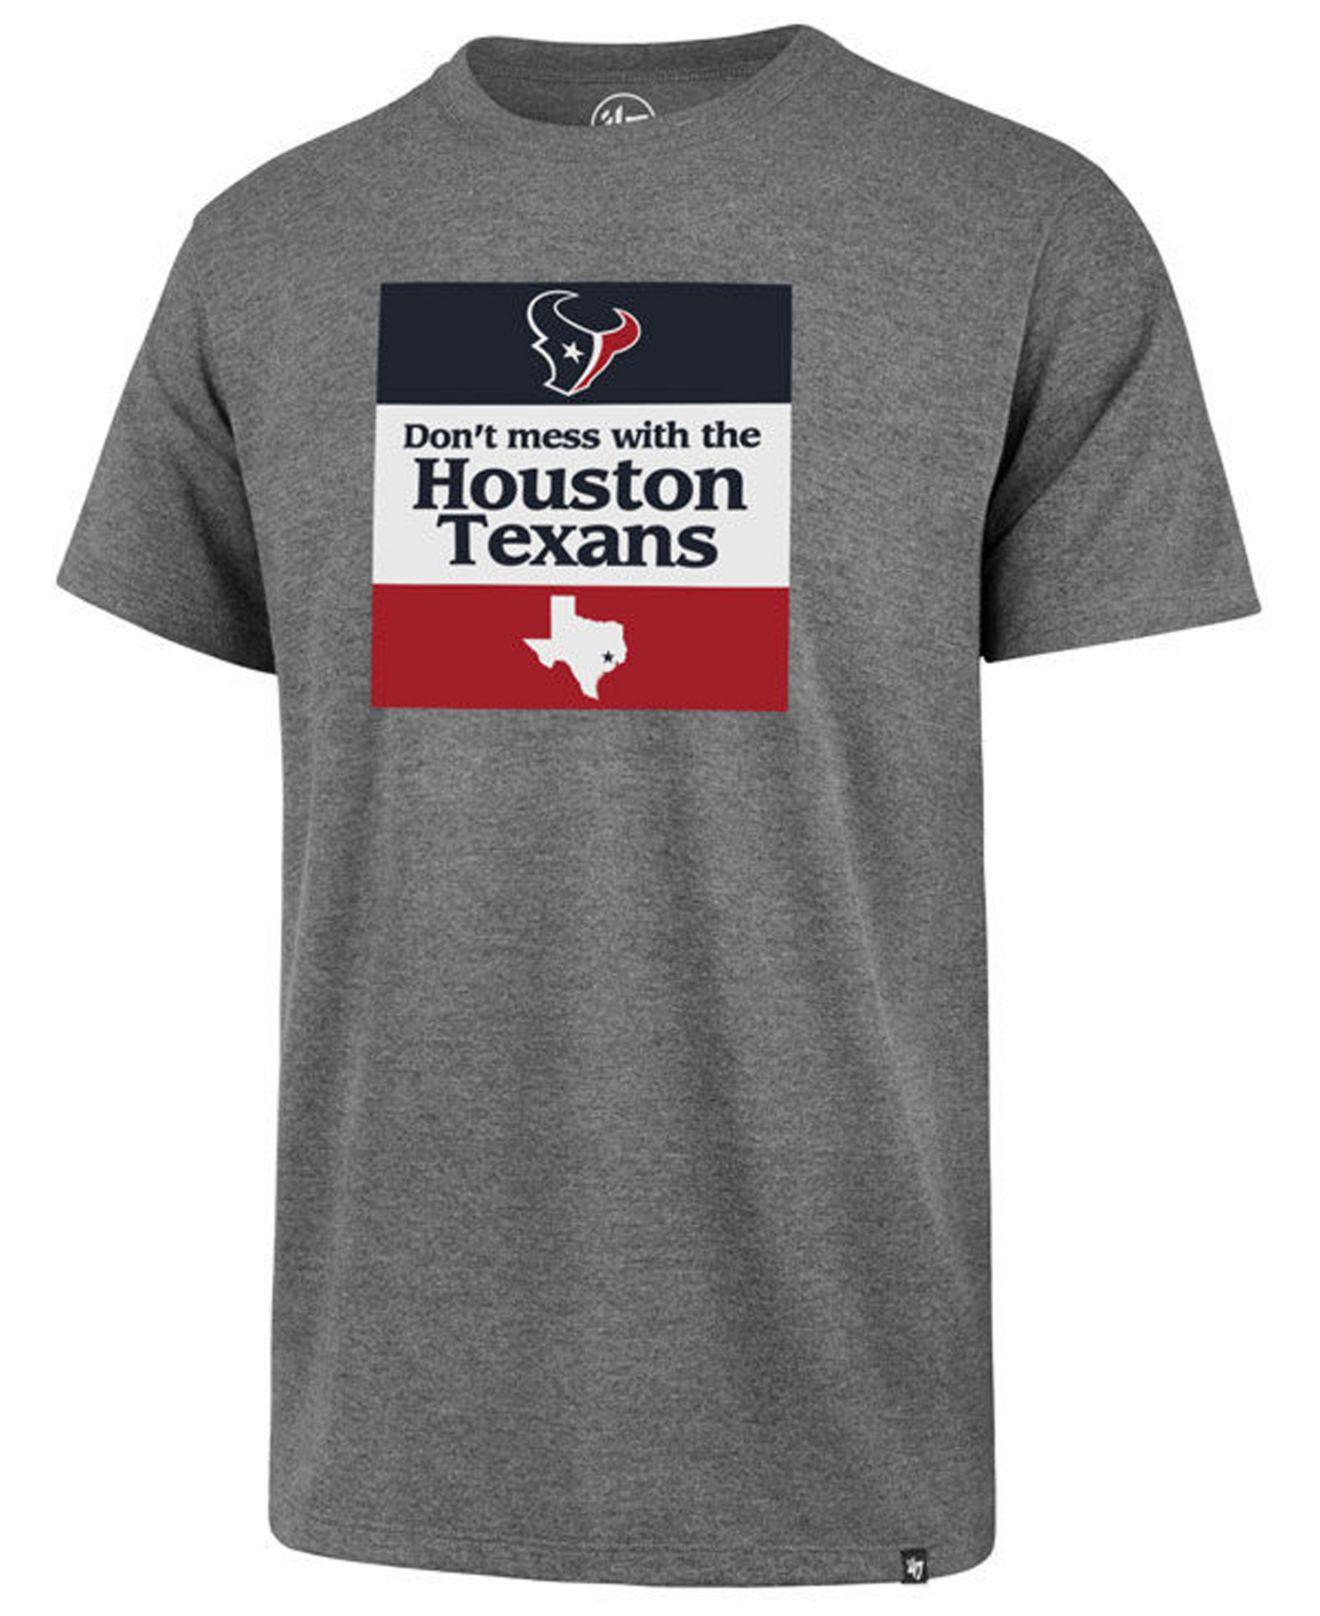 3b965a1e6 Lyst - 47 Brand Houston Texans Regional Slogan Club T-shirt in Gray ...